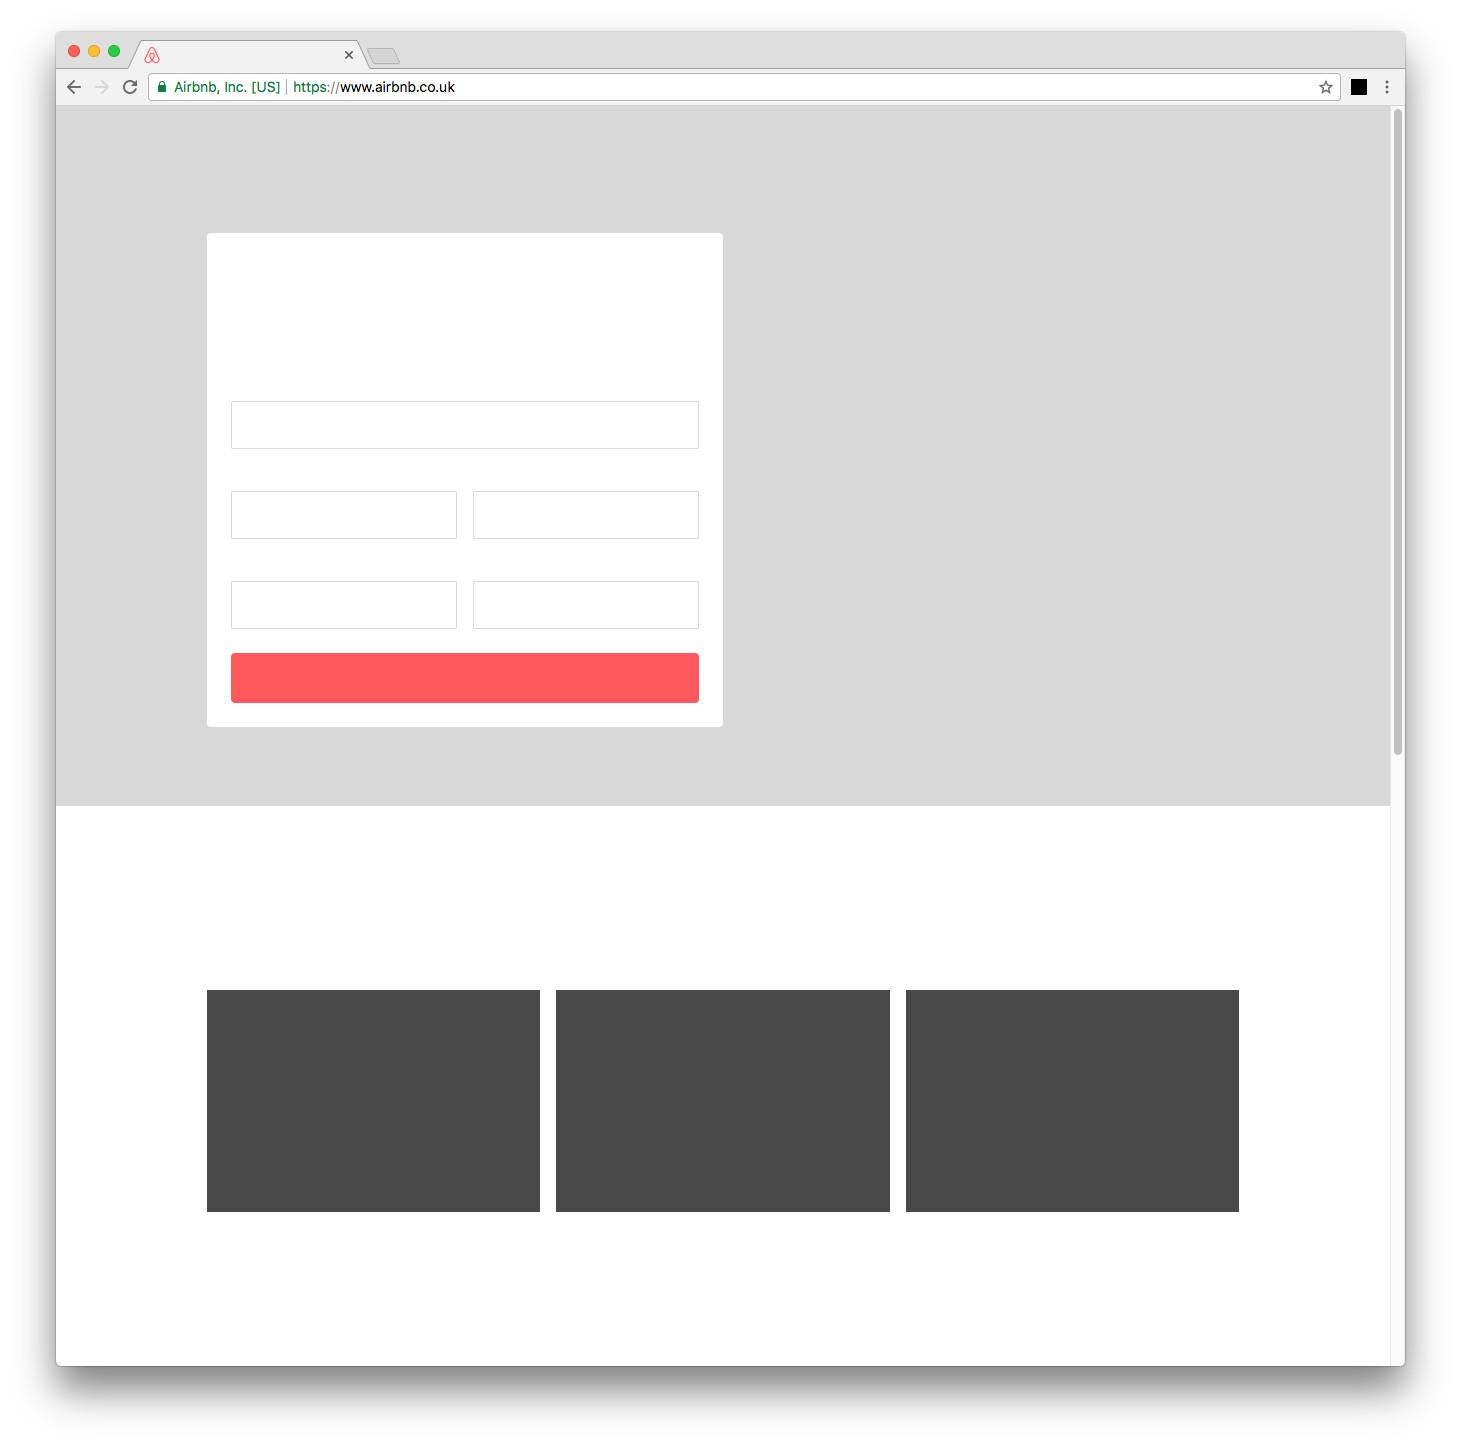 image-asset-2.jpg